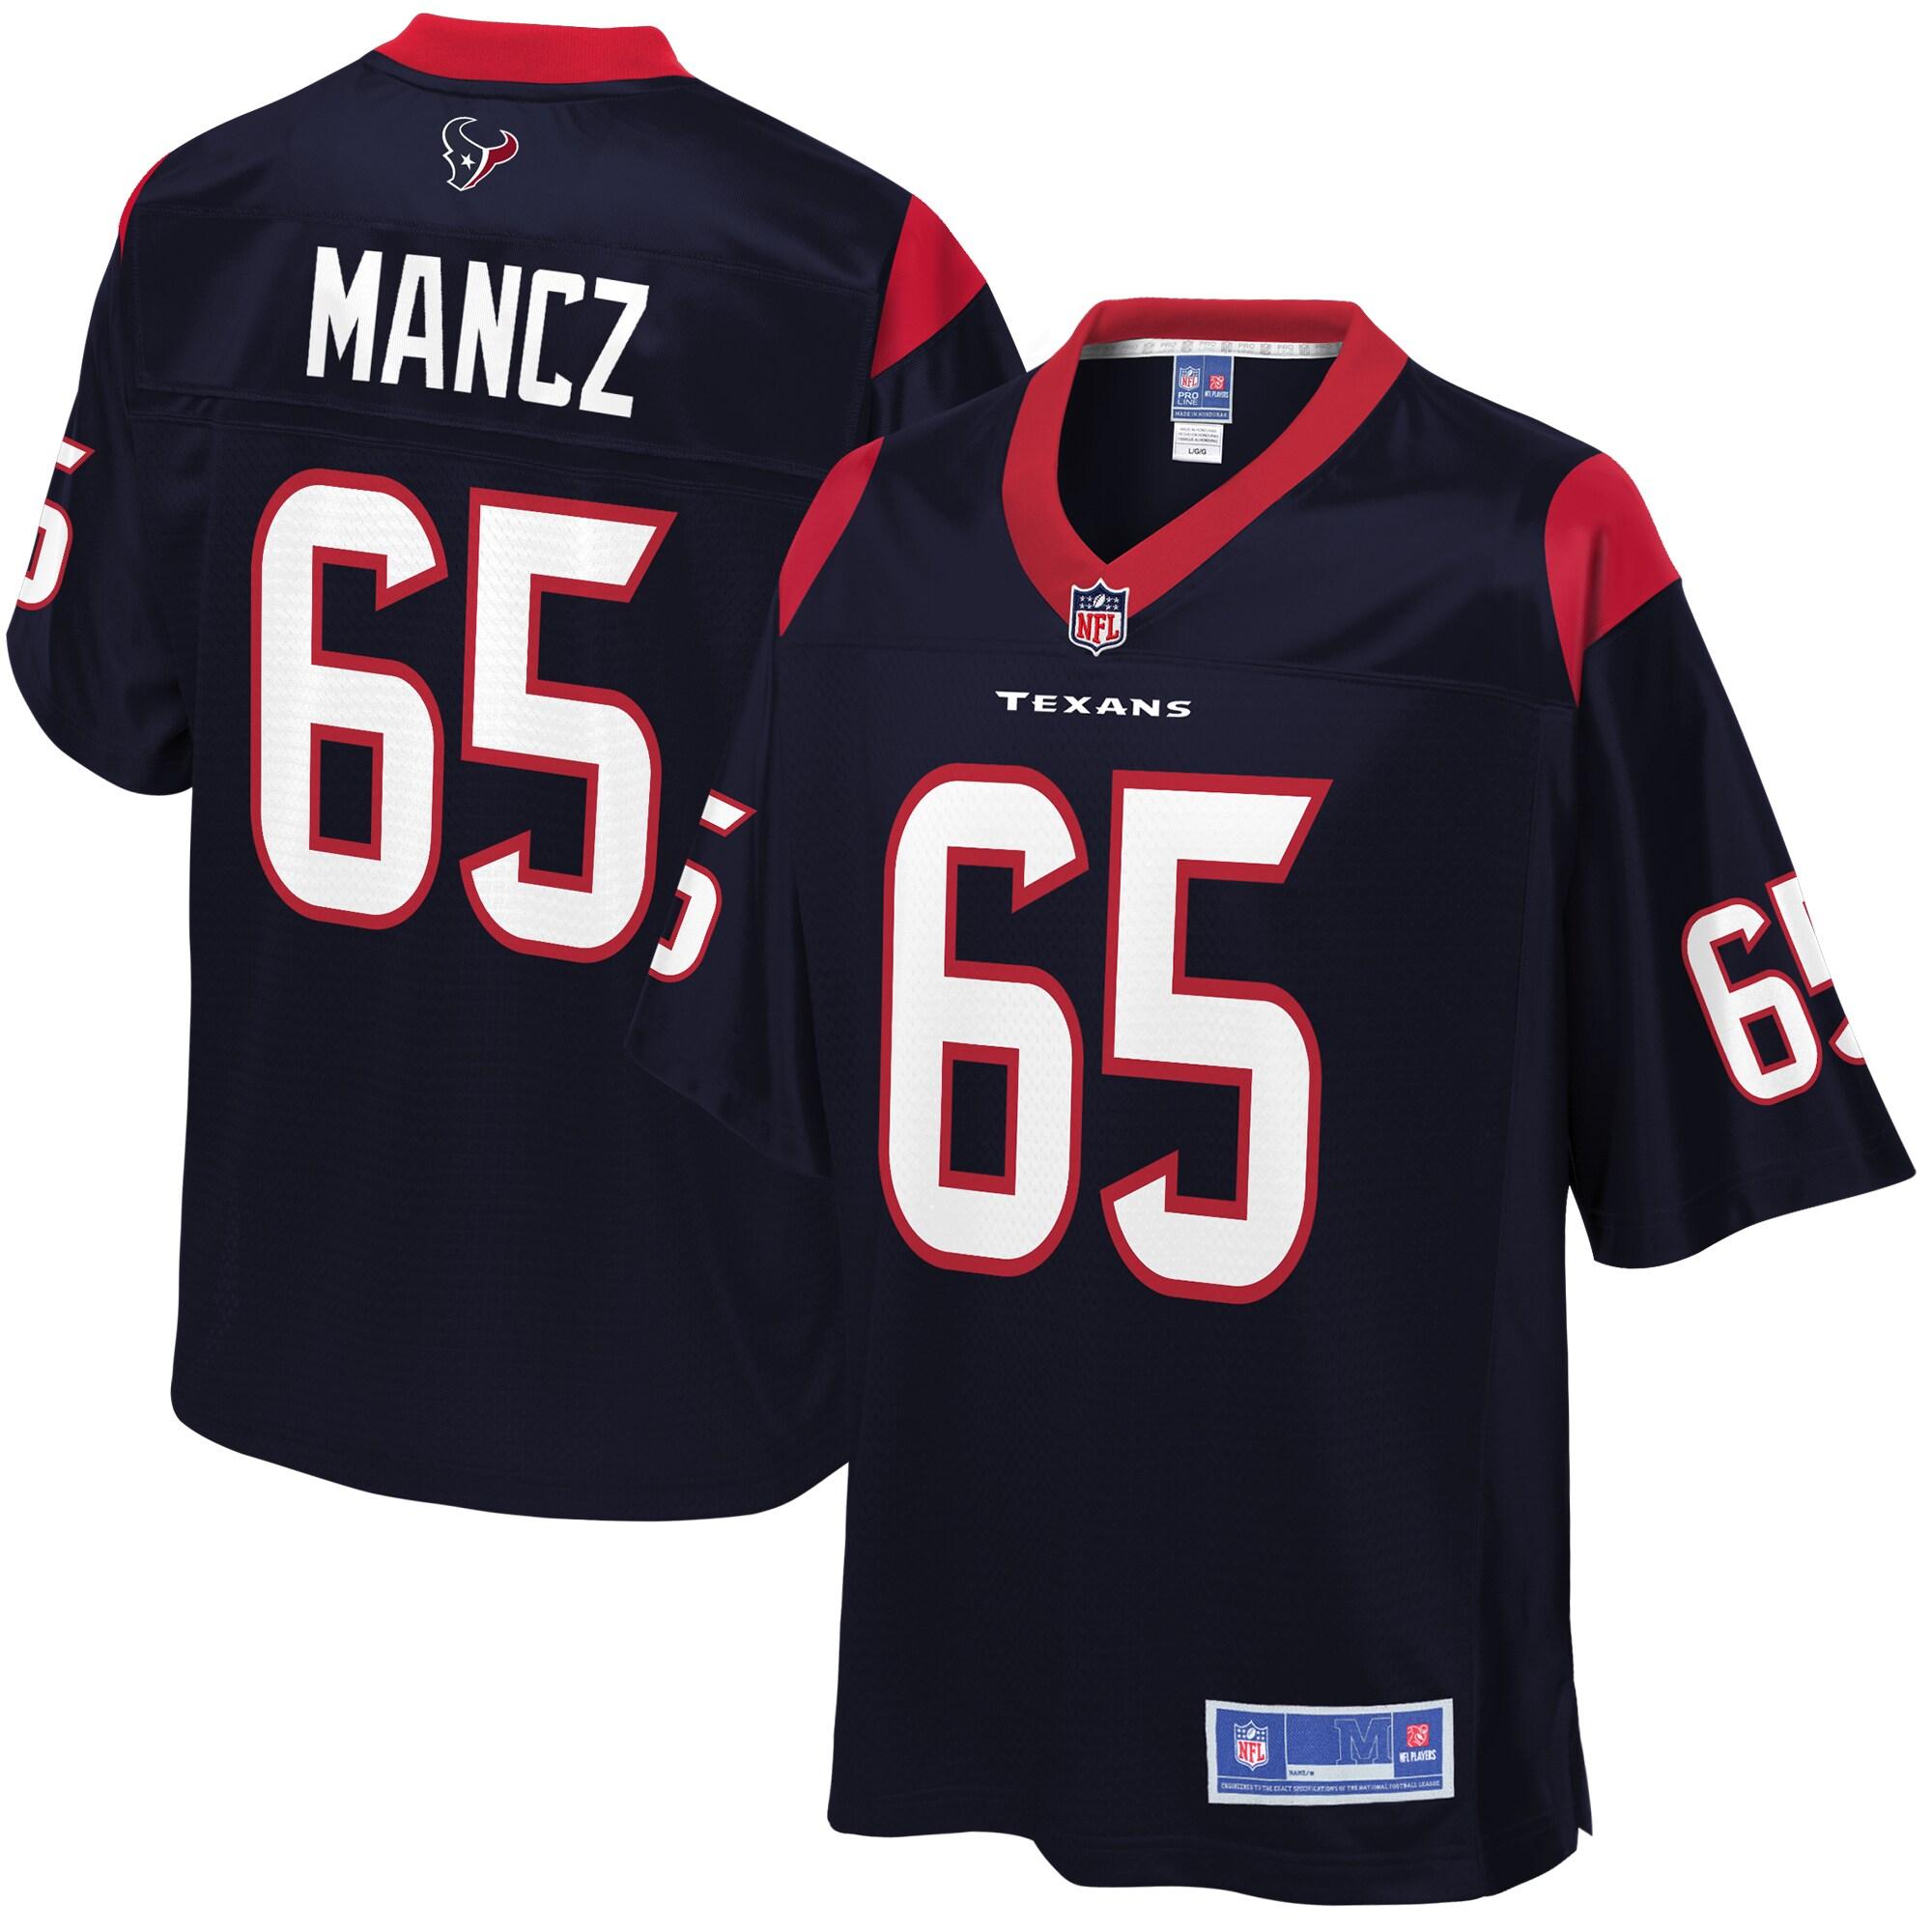 NFL Pro Line Youth Houston Texans Greg Mancz Team Color Jersey